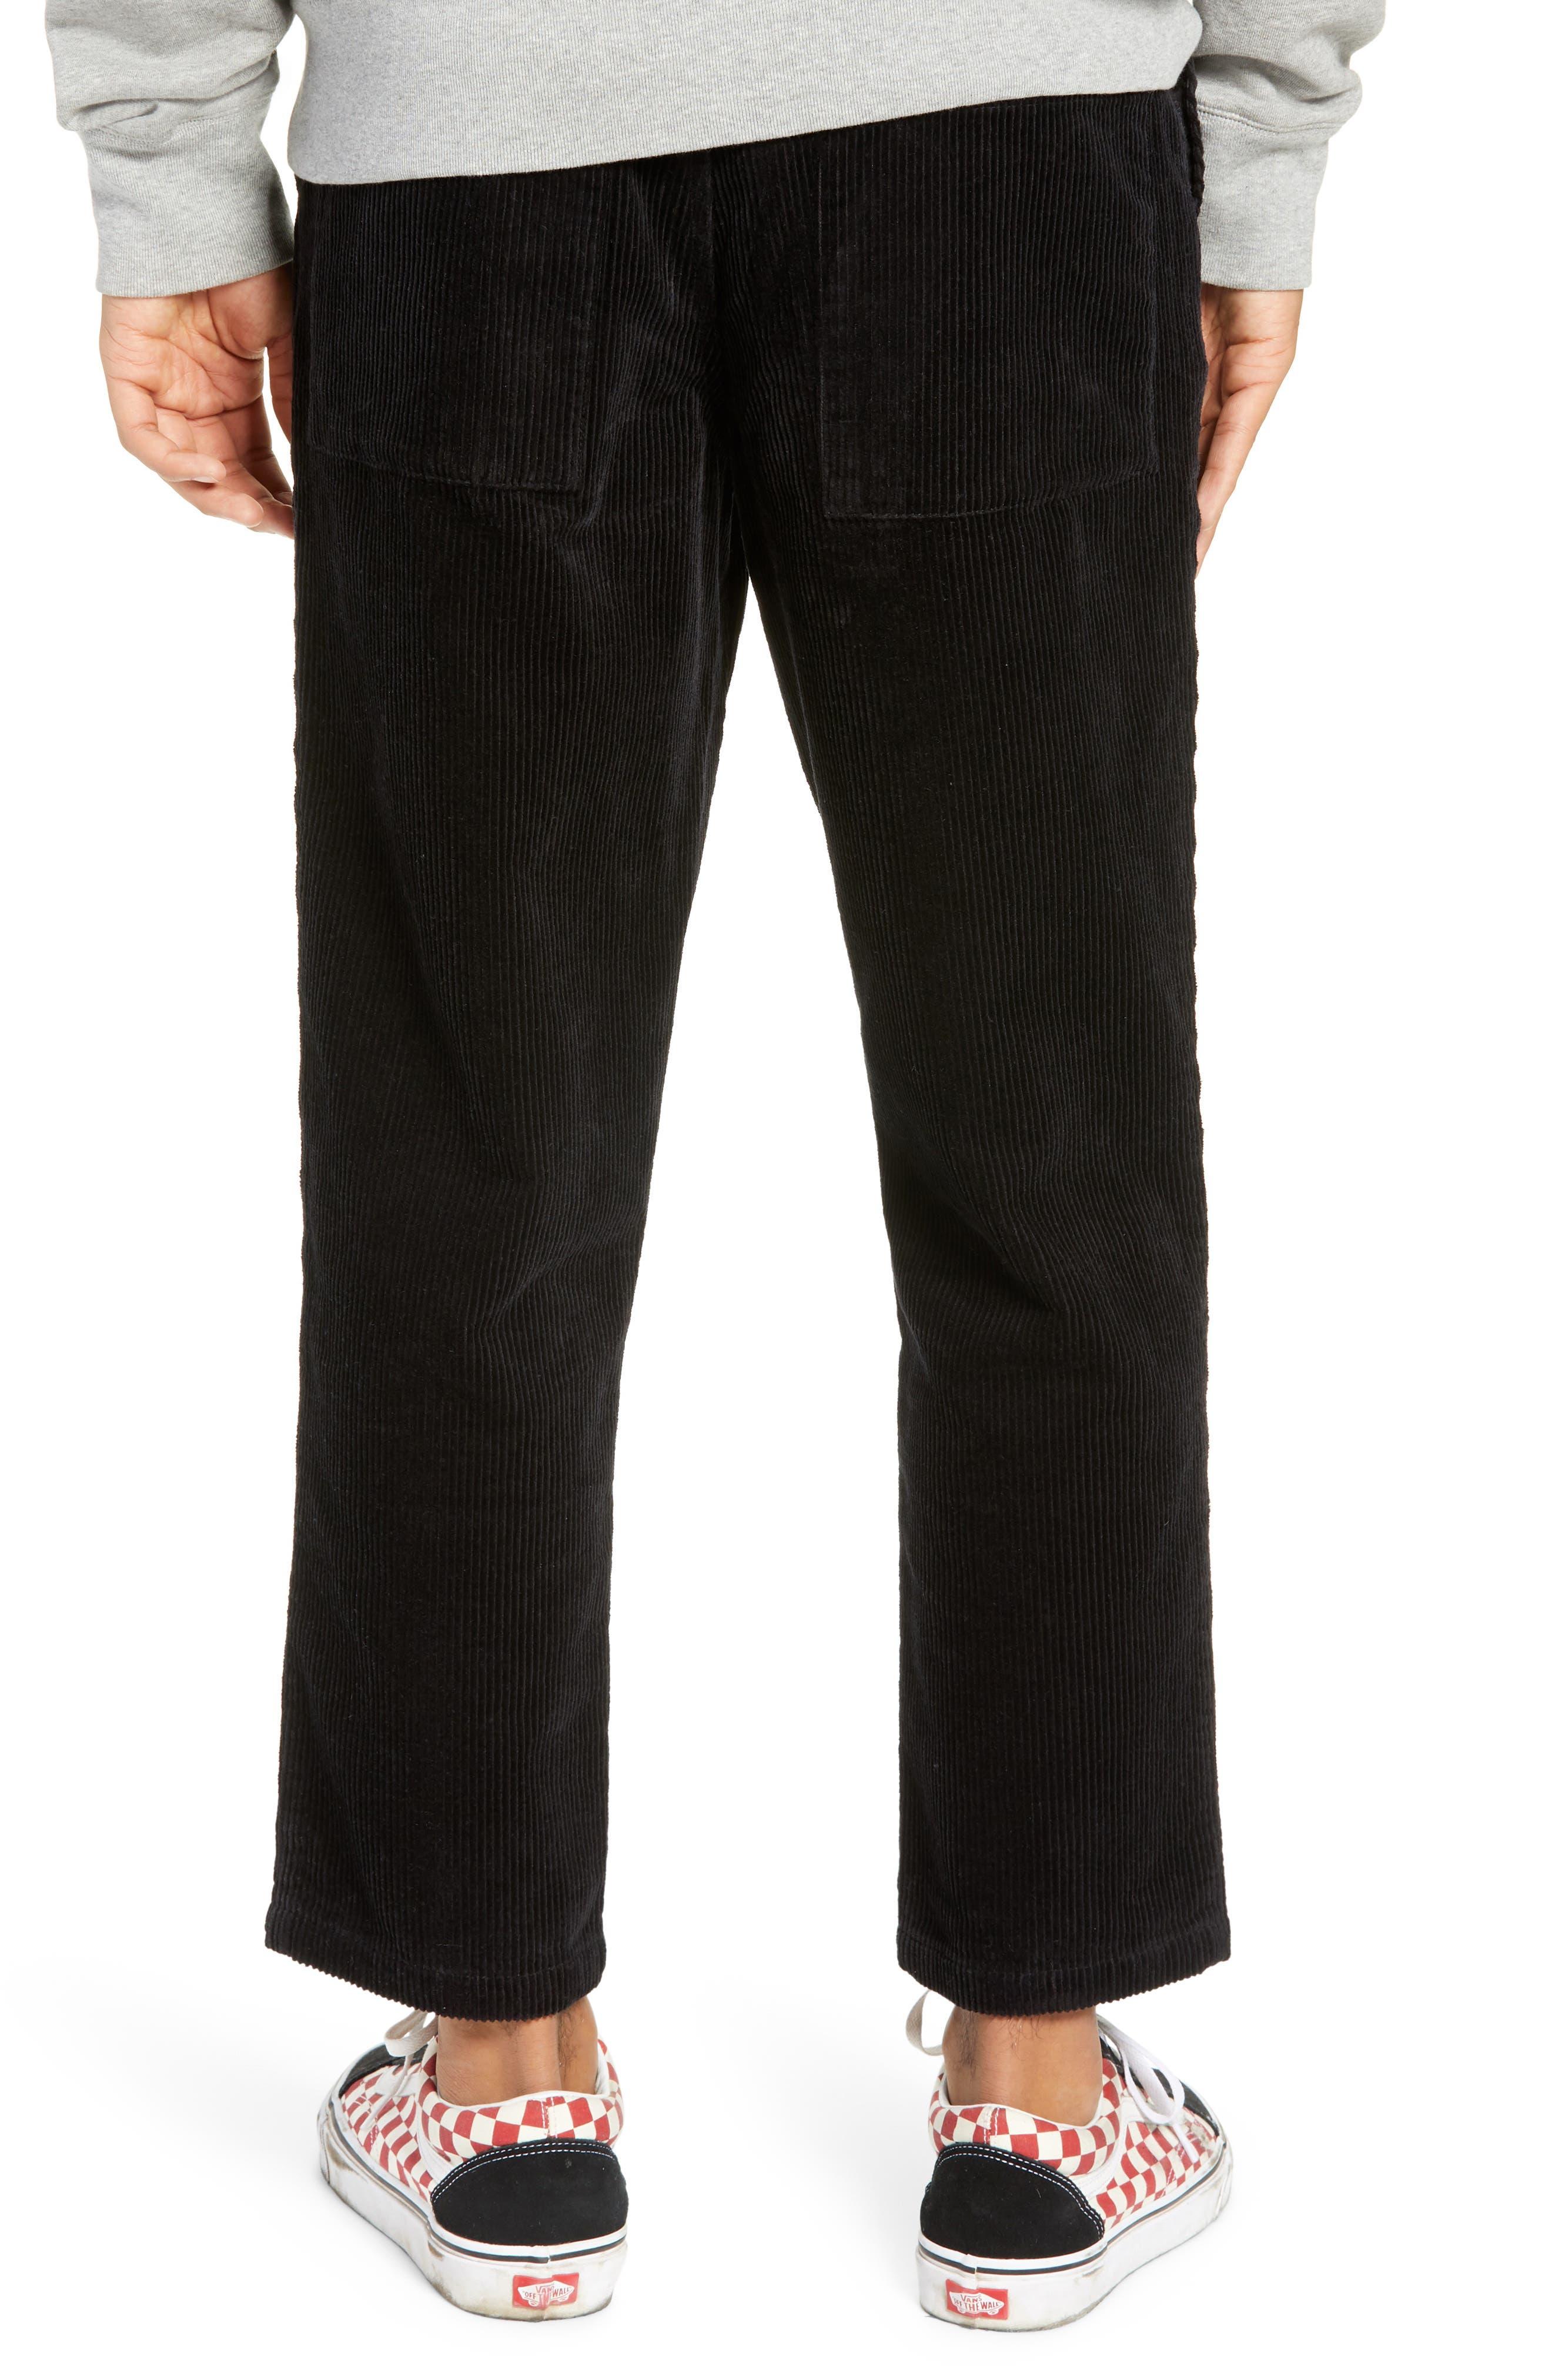 Iggy Wide Wale Cotton Corduroy Straight Leg Pants,                             Alternate thumbnail 2, color,                             BLACK